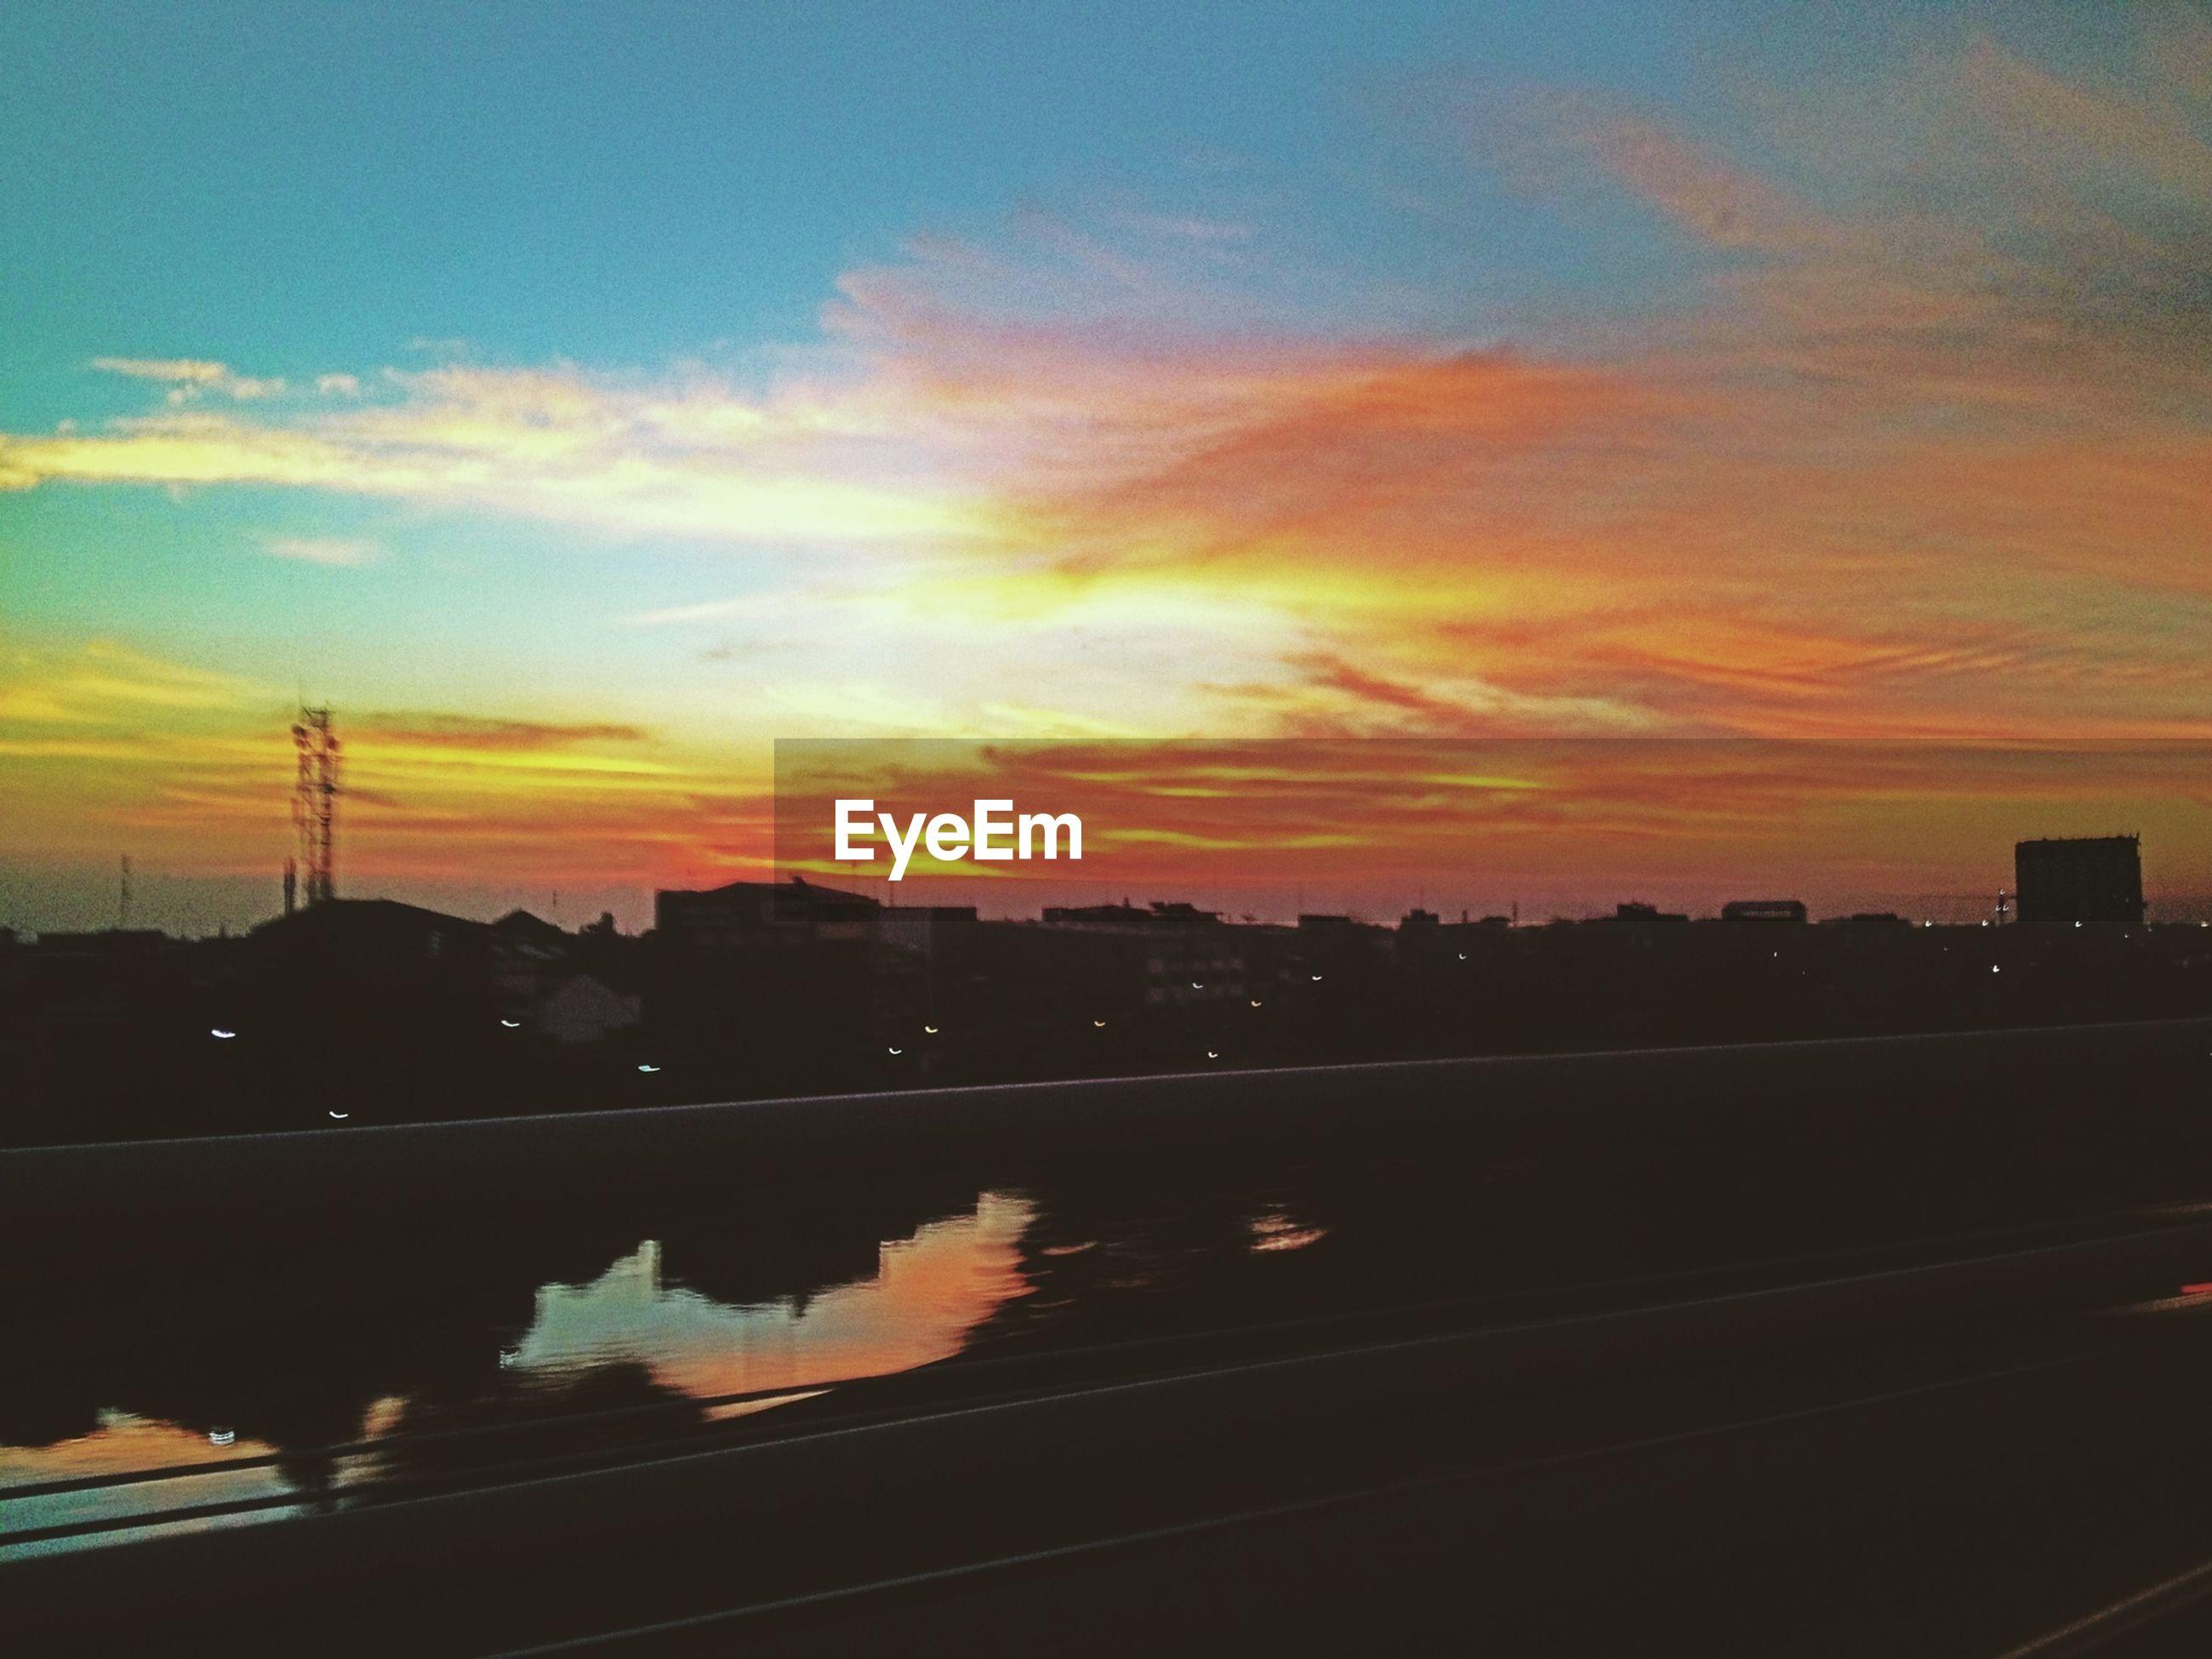 sunset, silhouette, orange color, sky, transportation, cloud - sky, city, building exterior, street light, railroad track, built structure, architecture, tree, car, road, dusk, nature, mode of transport, beauty in nature, scenics